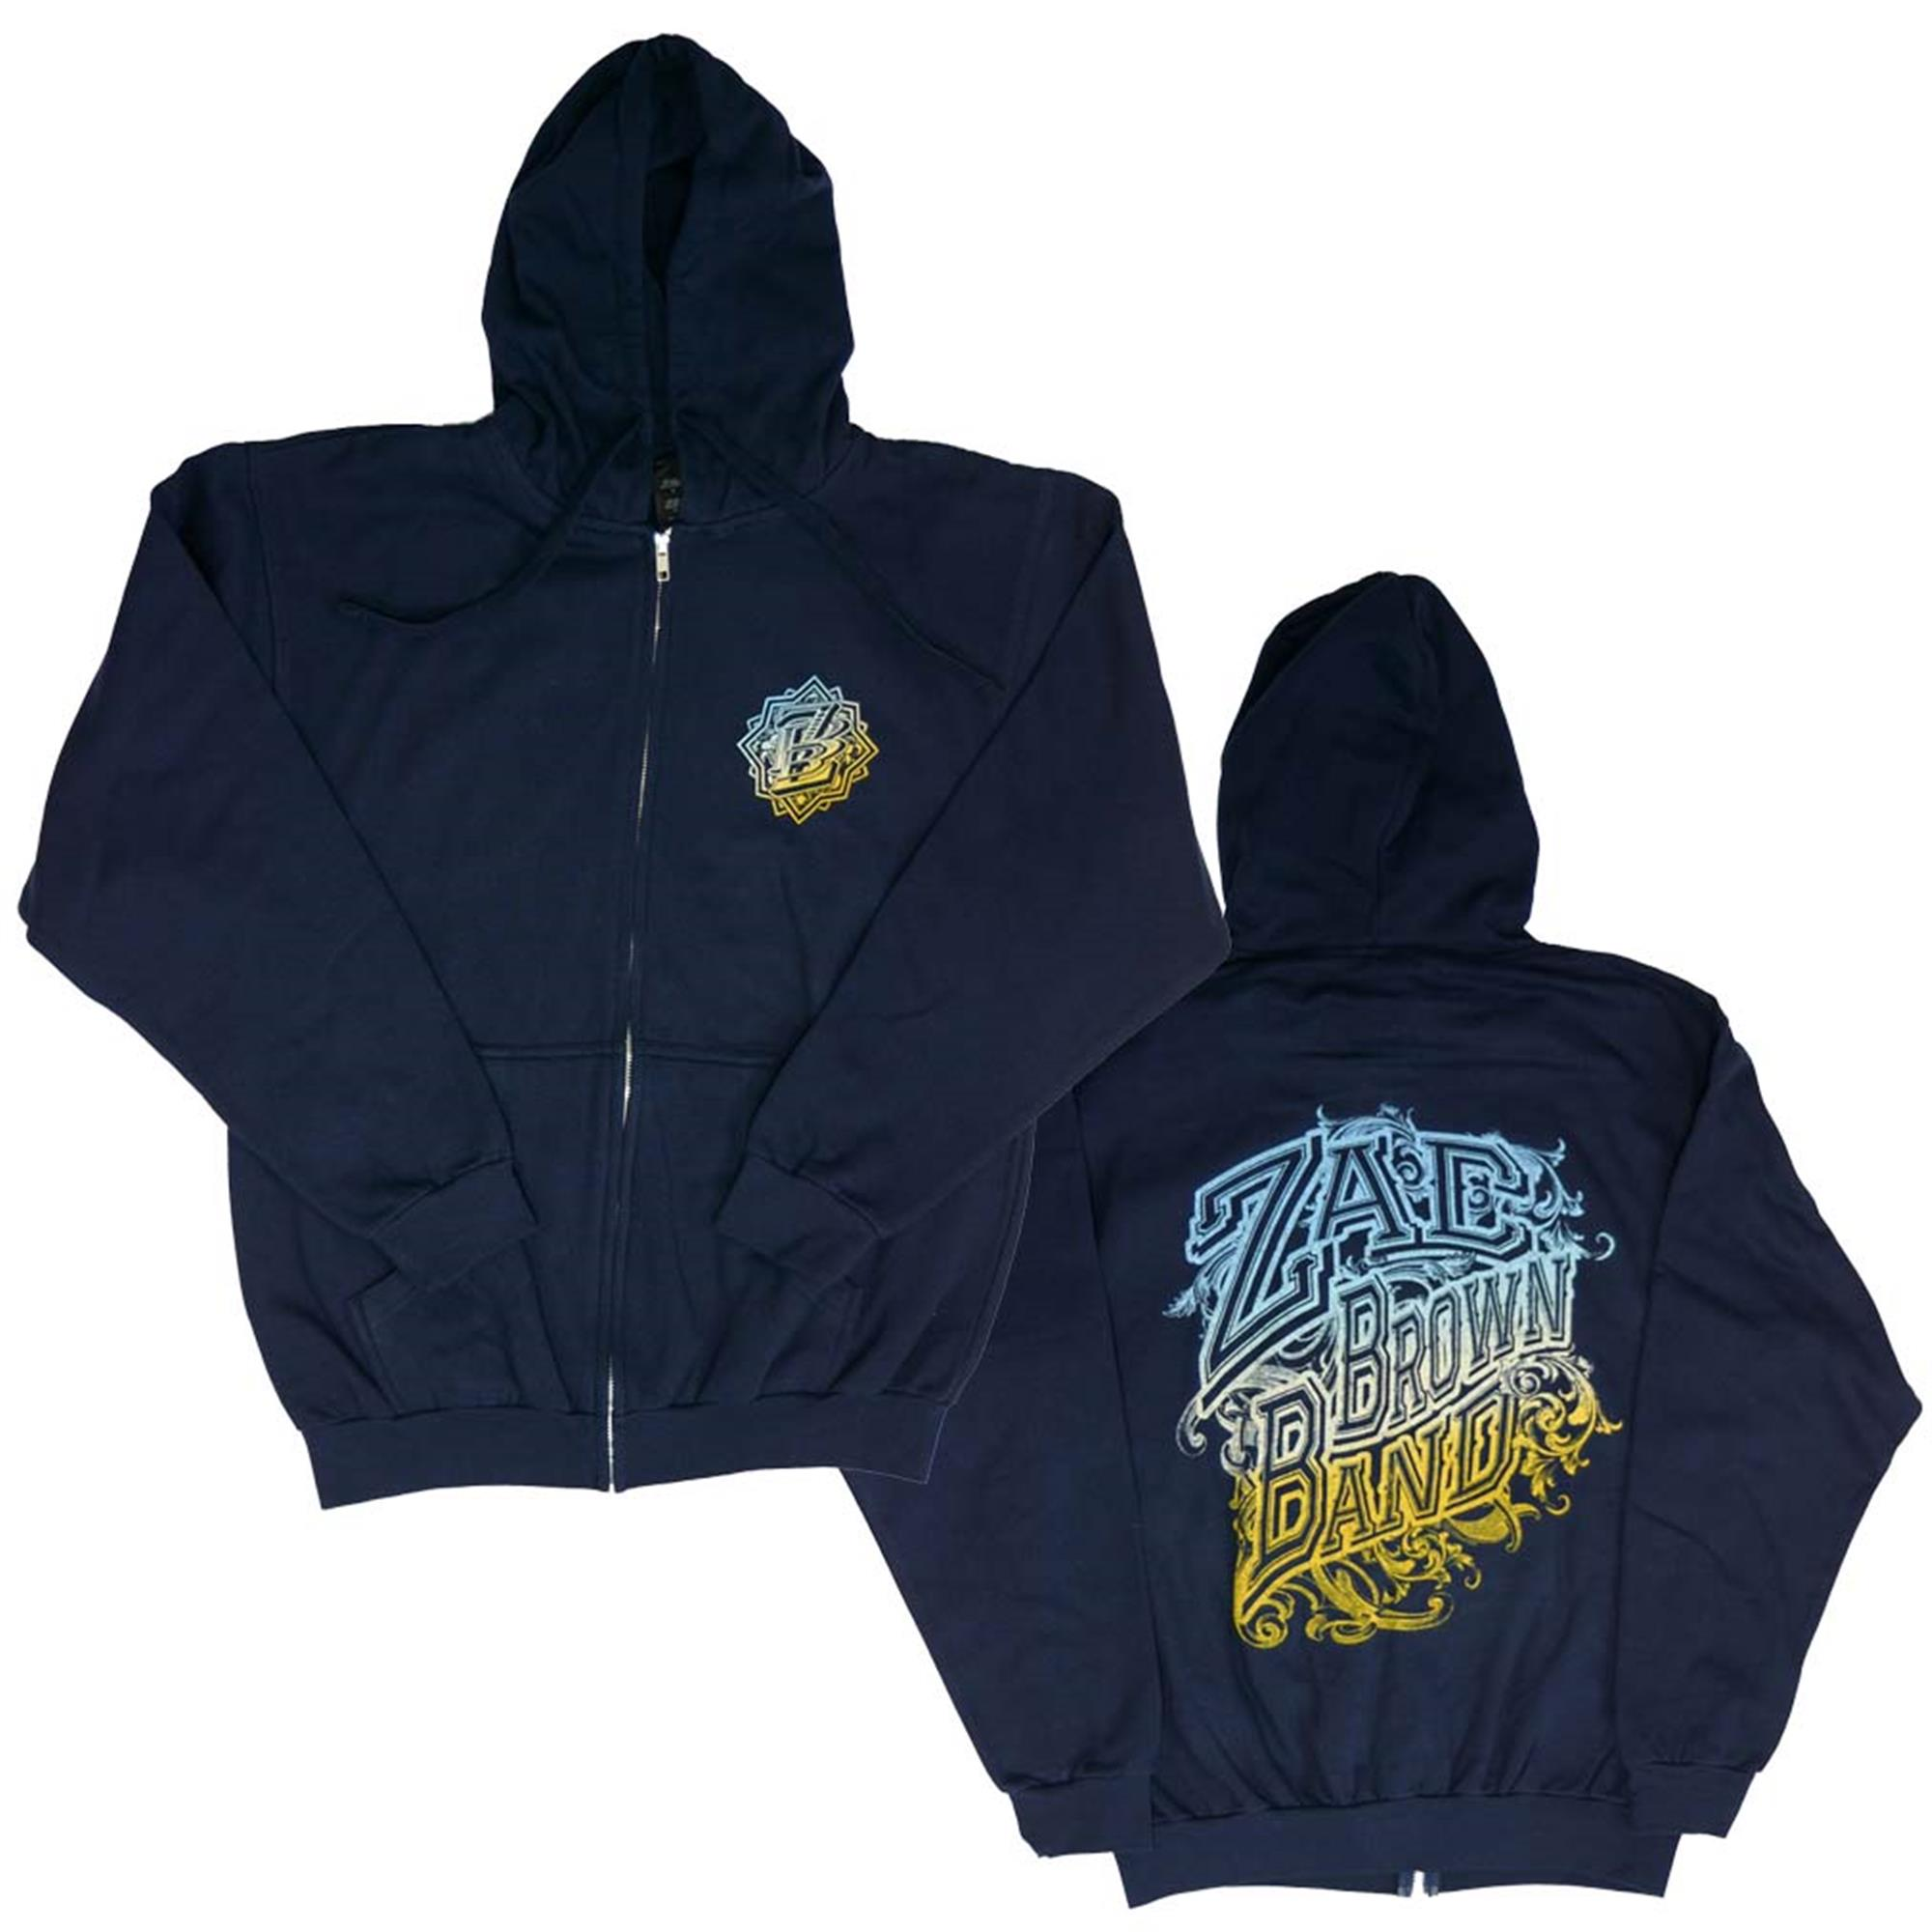 Zac Brown Band Logo Zip Hoodie Sweatshirt